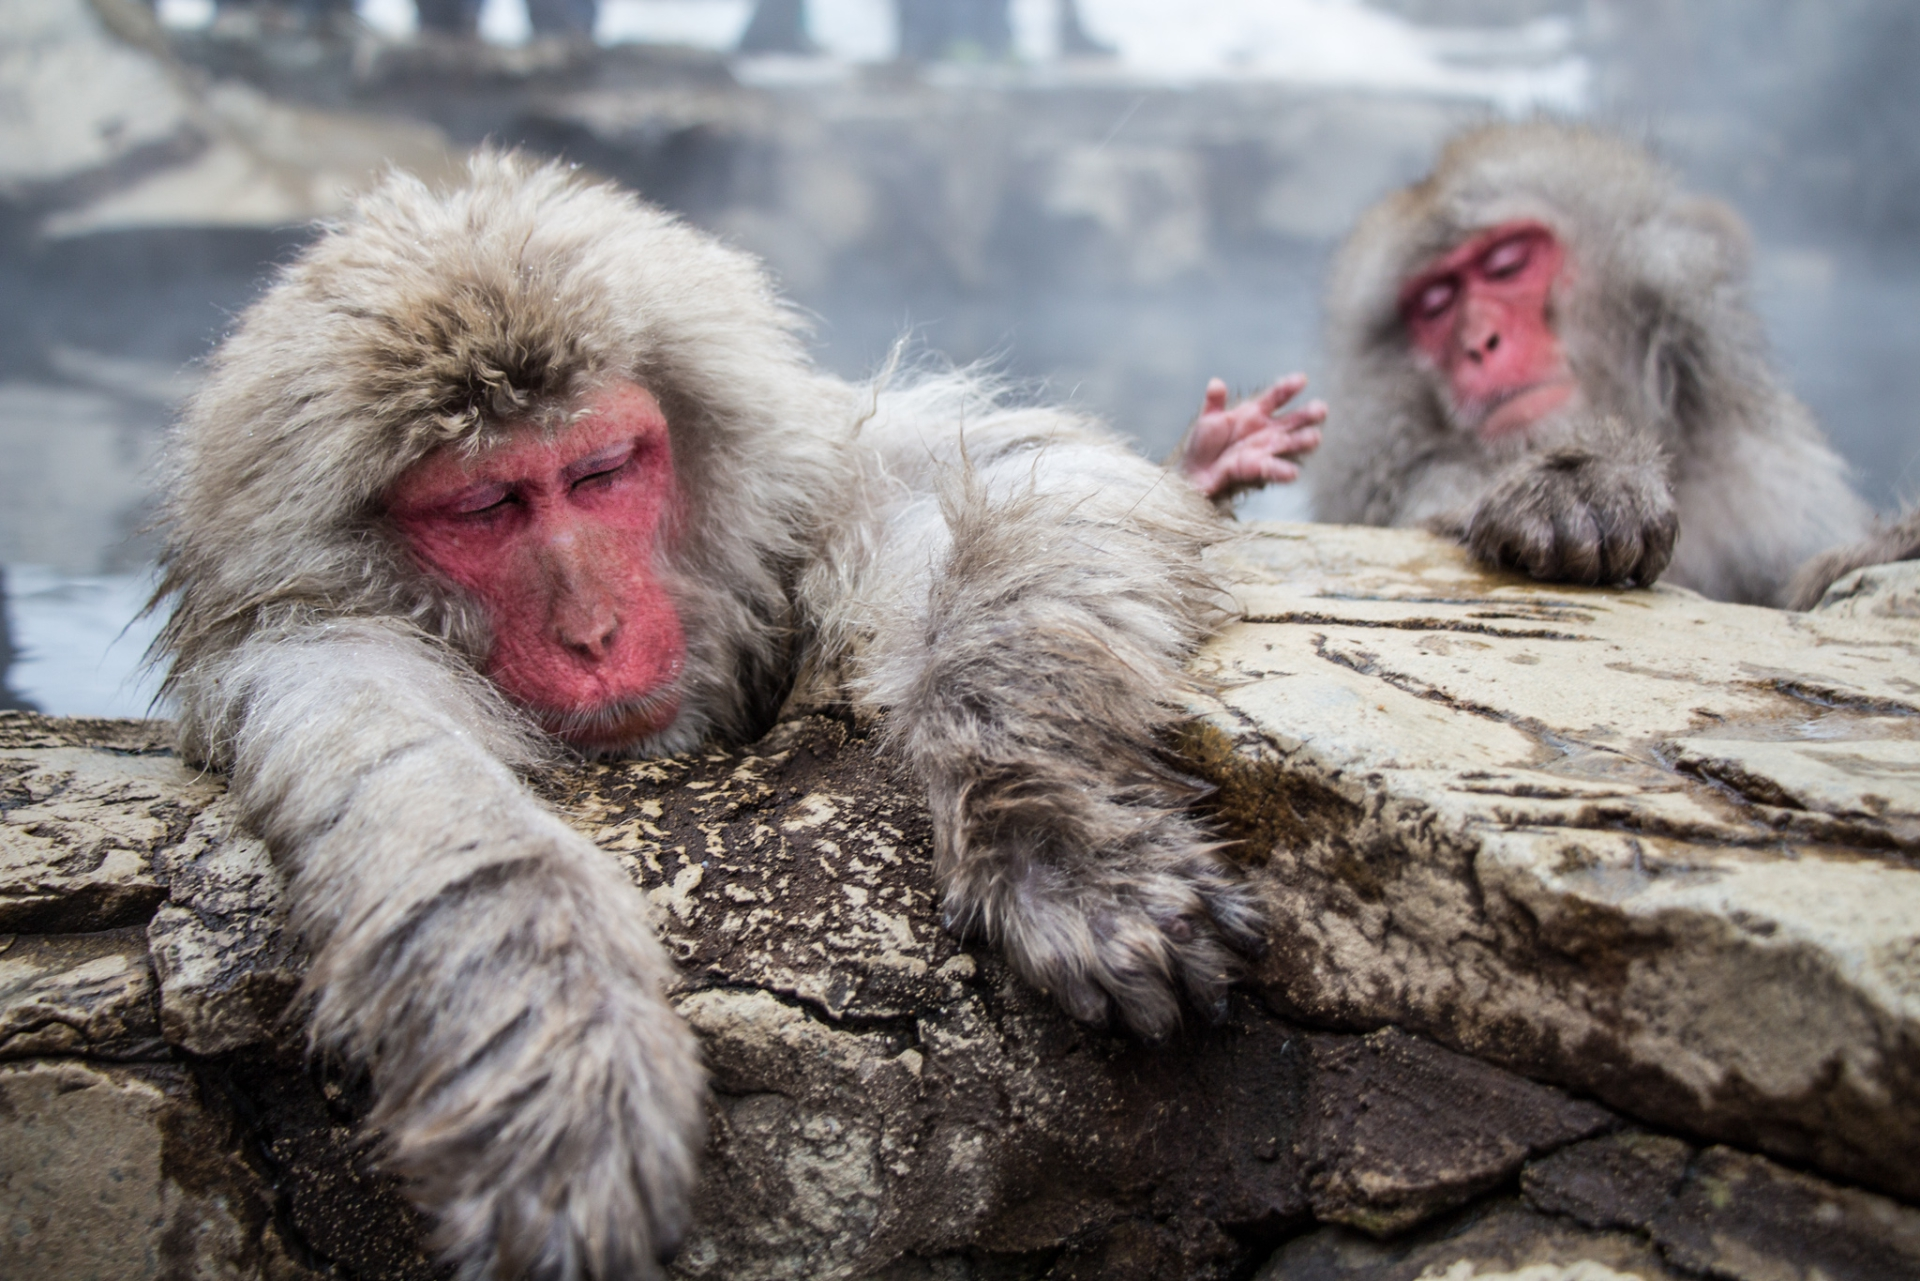 Snow Monkeys Relaxing, Japan